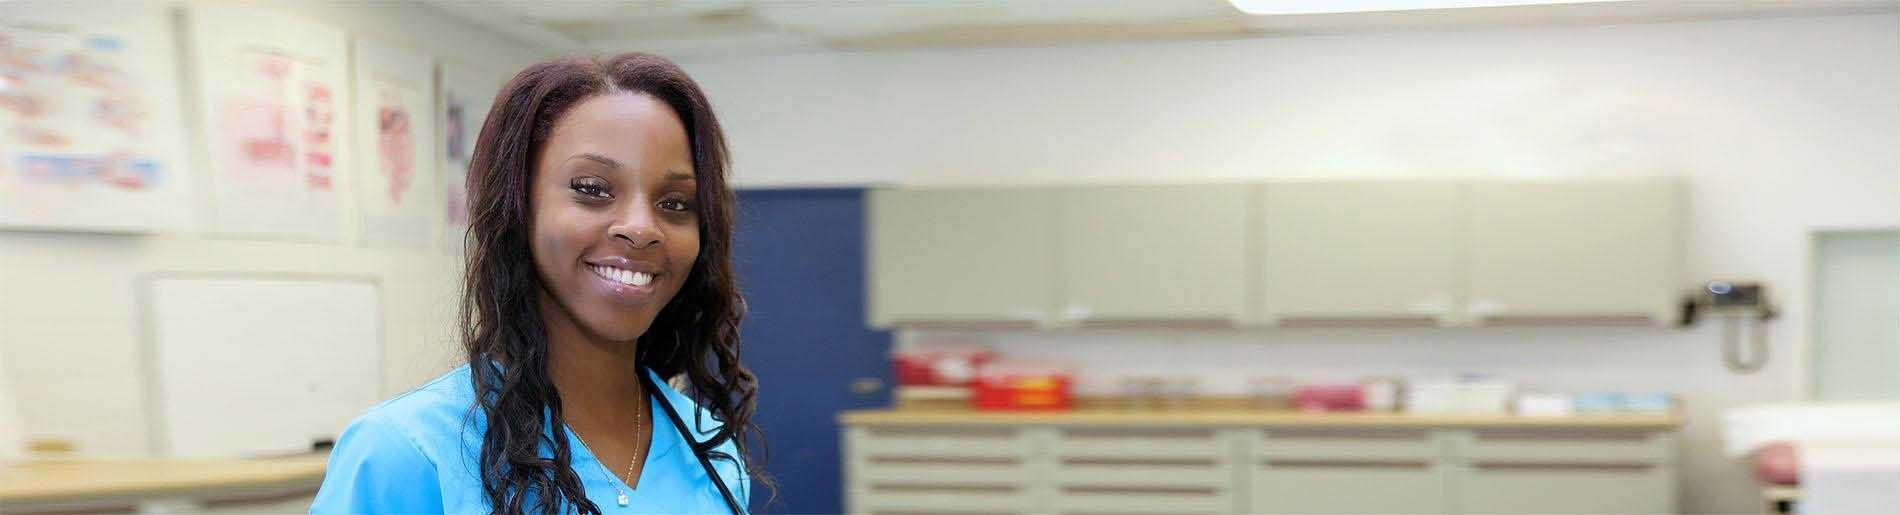 Pharmacy Technician Training at Dorsey Schools of Michigan